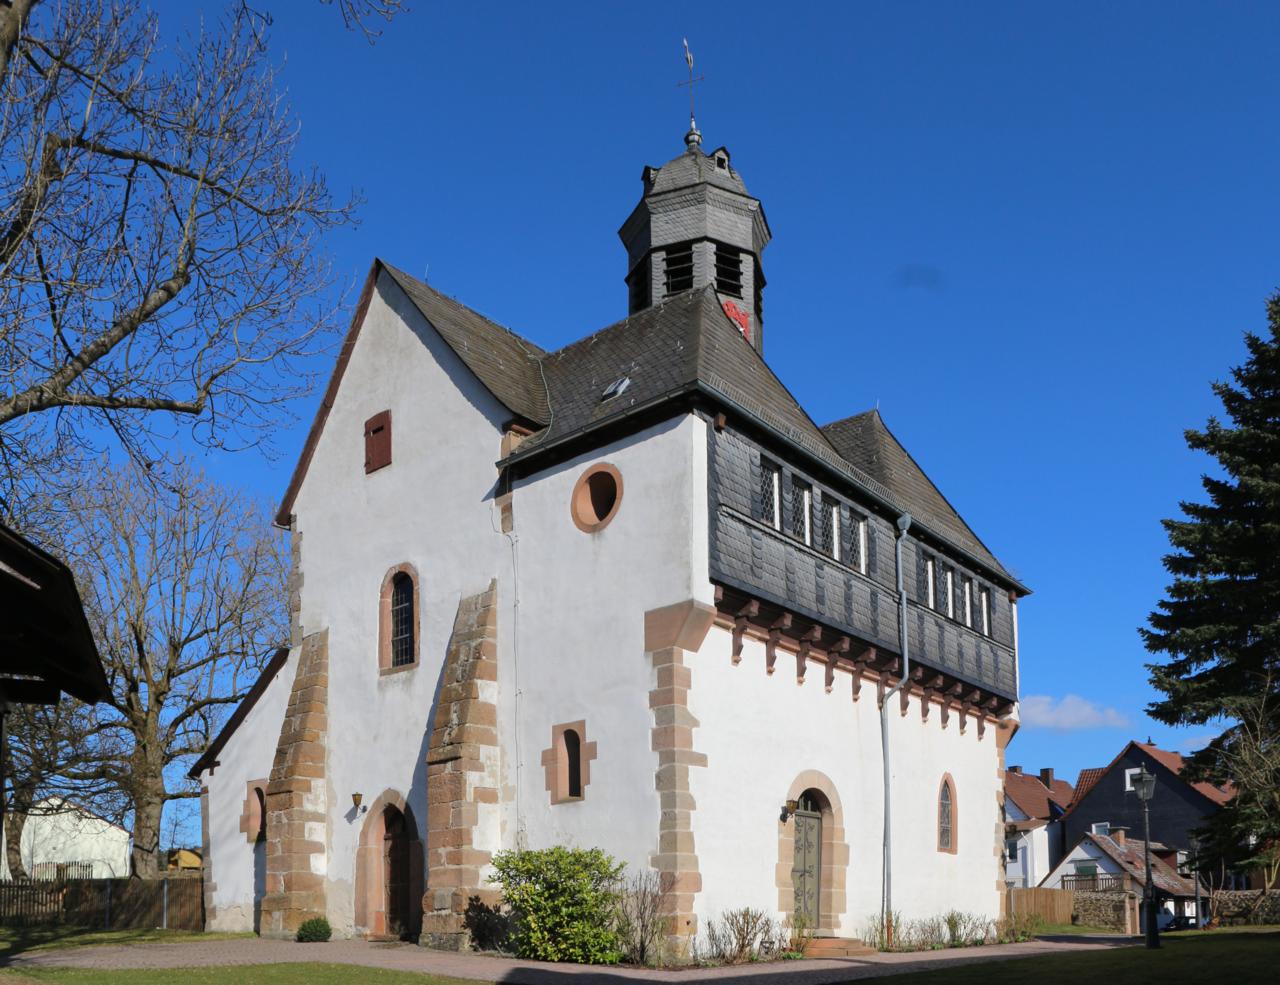 Kirche Lohra, Bildquelle: Gerold Rosenberg, Wikipedia